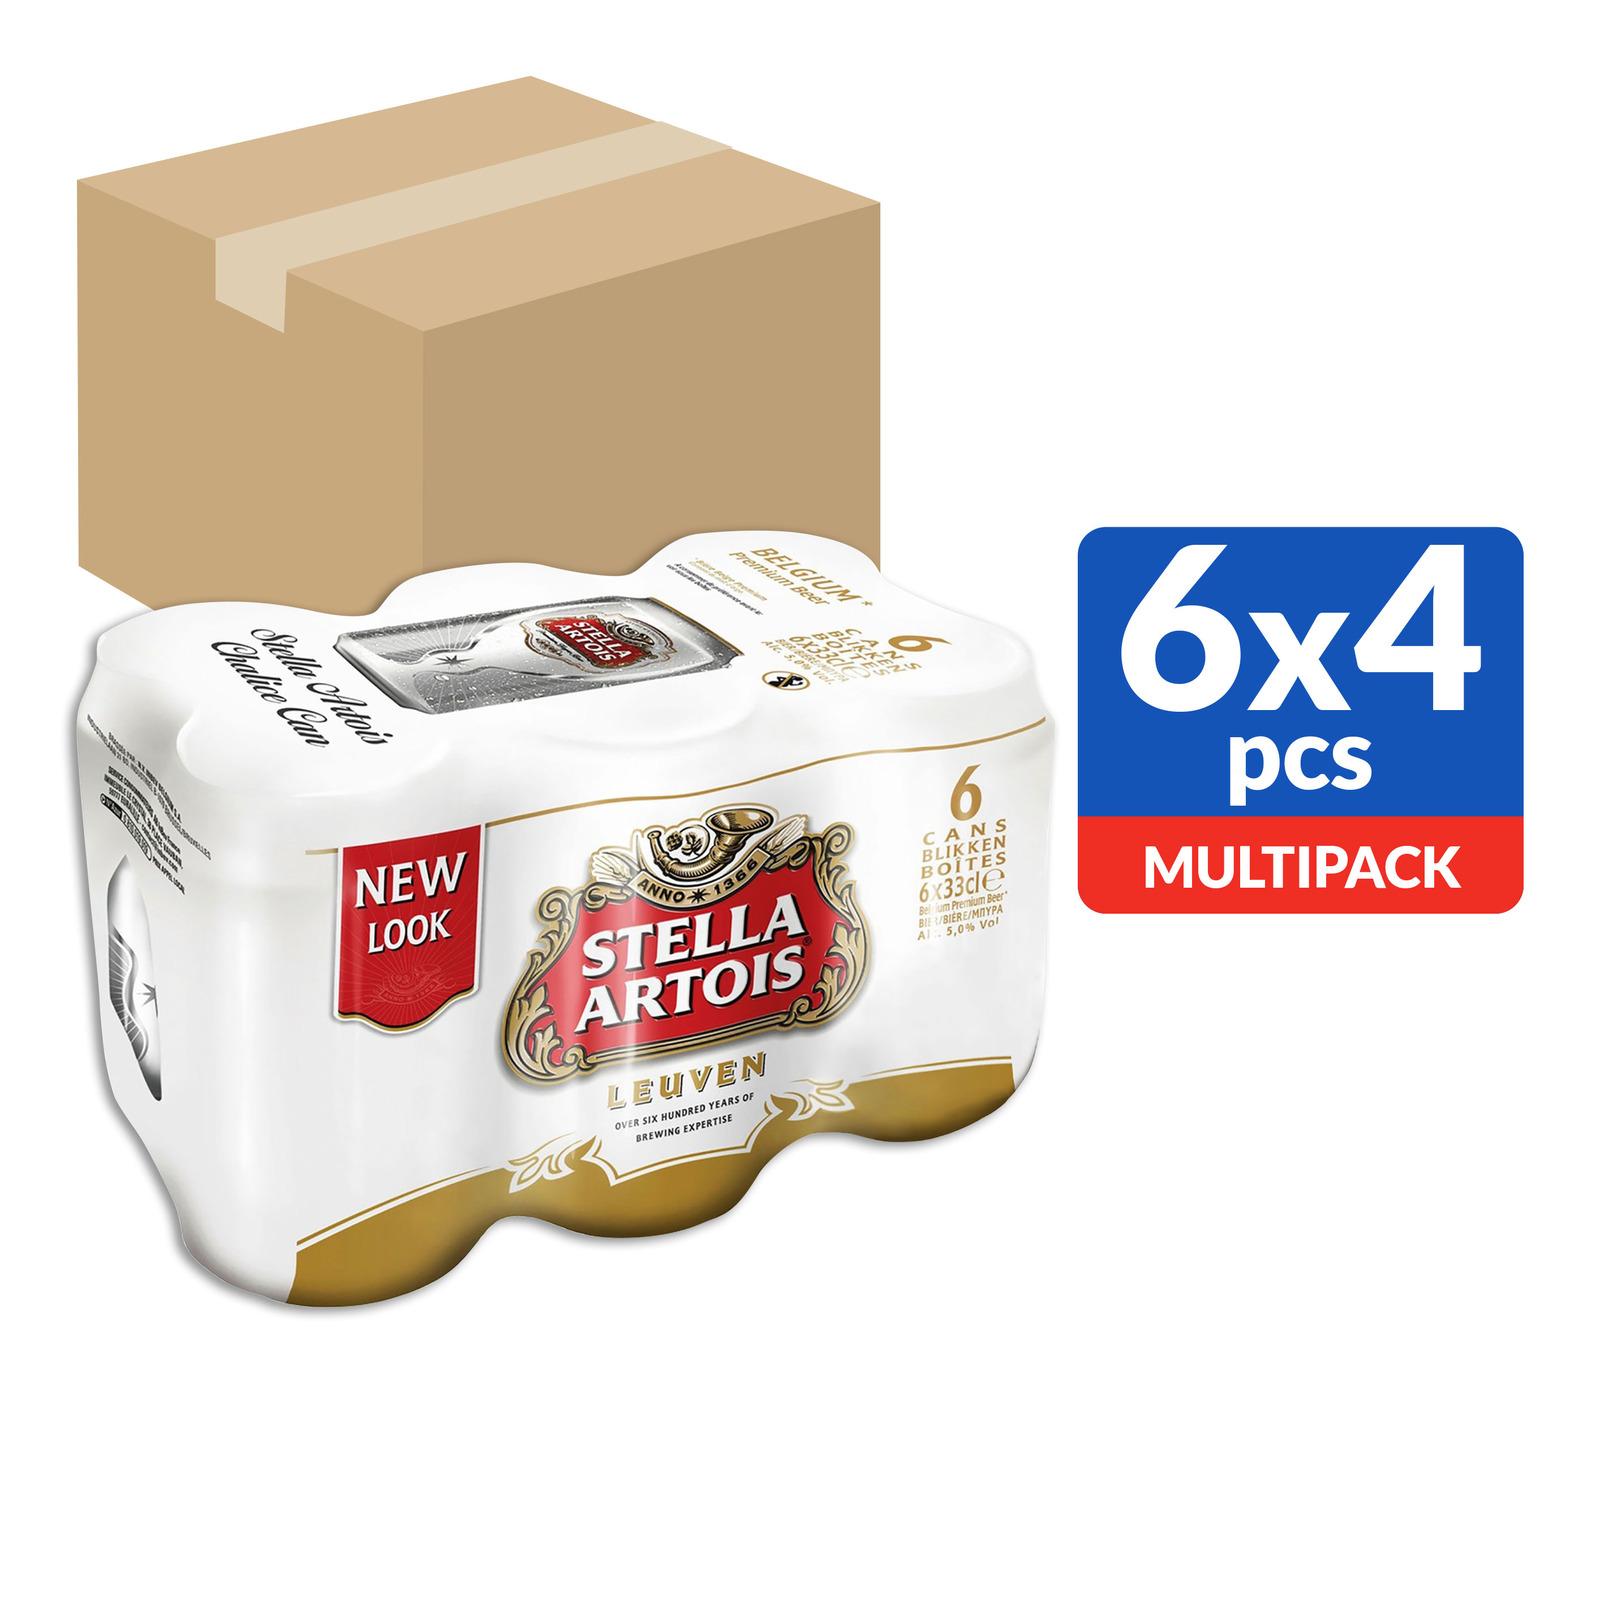 Stella Artois Leuven Lager Can Beer